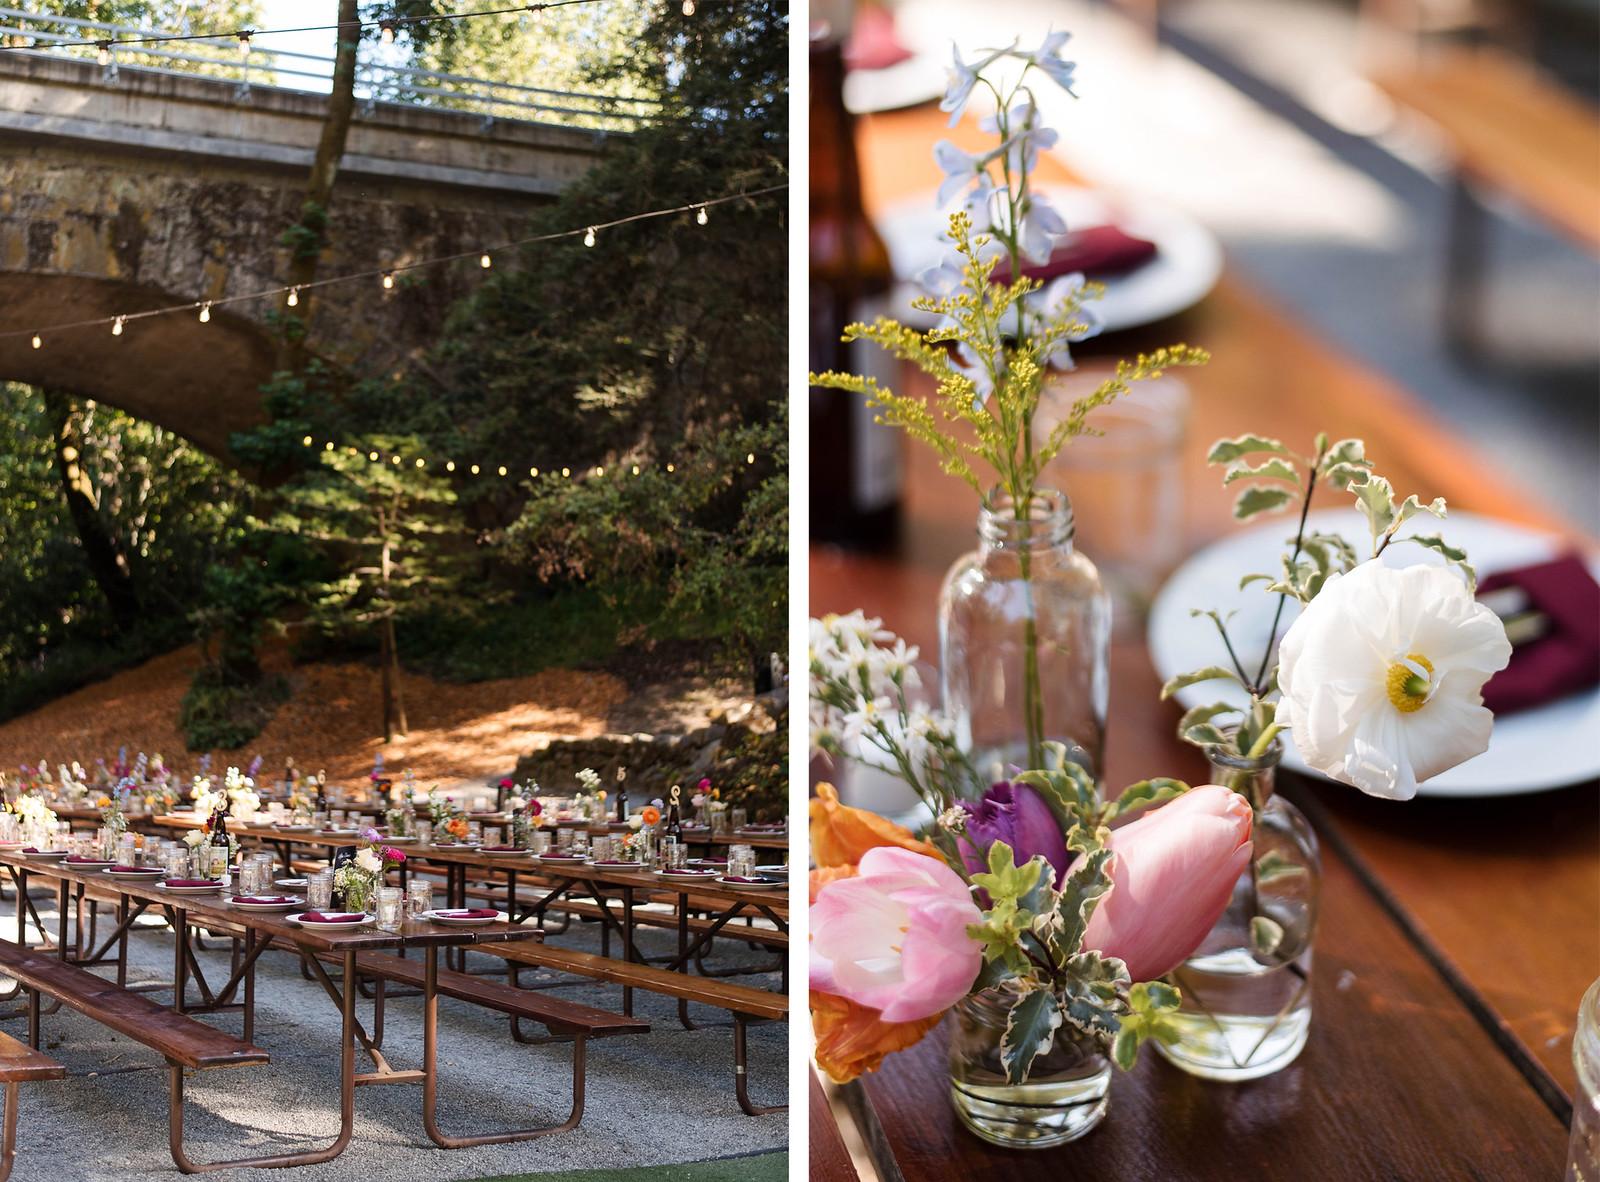 saratoga-springs-california-wedding on juliettelaura.com